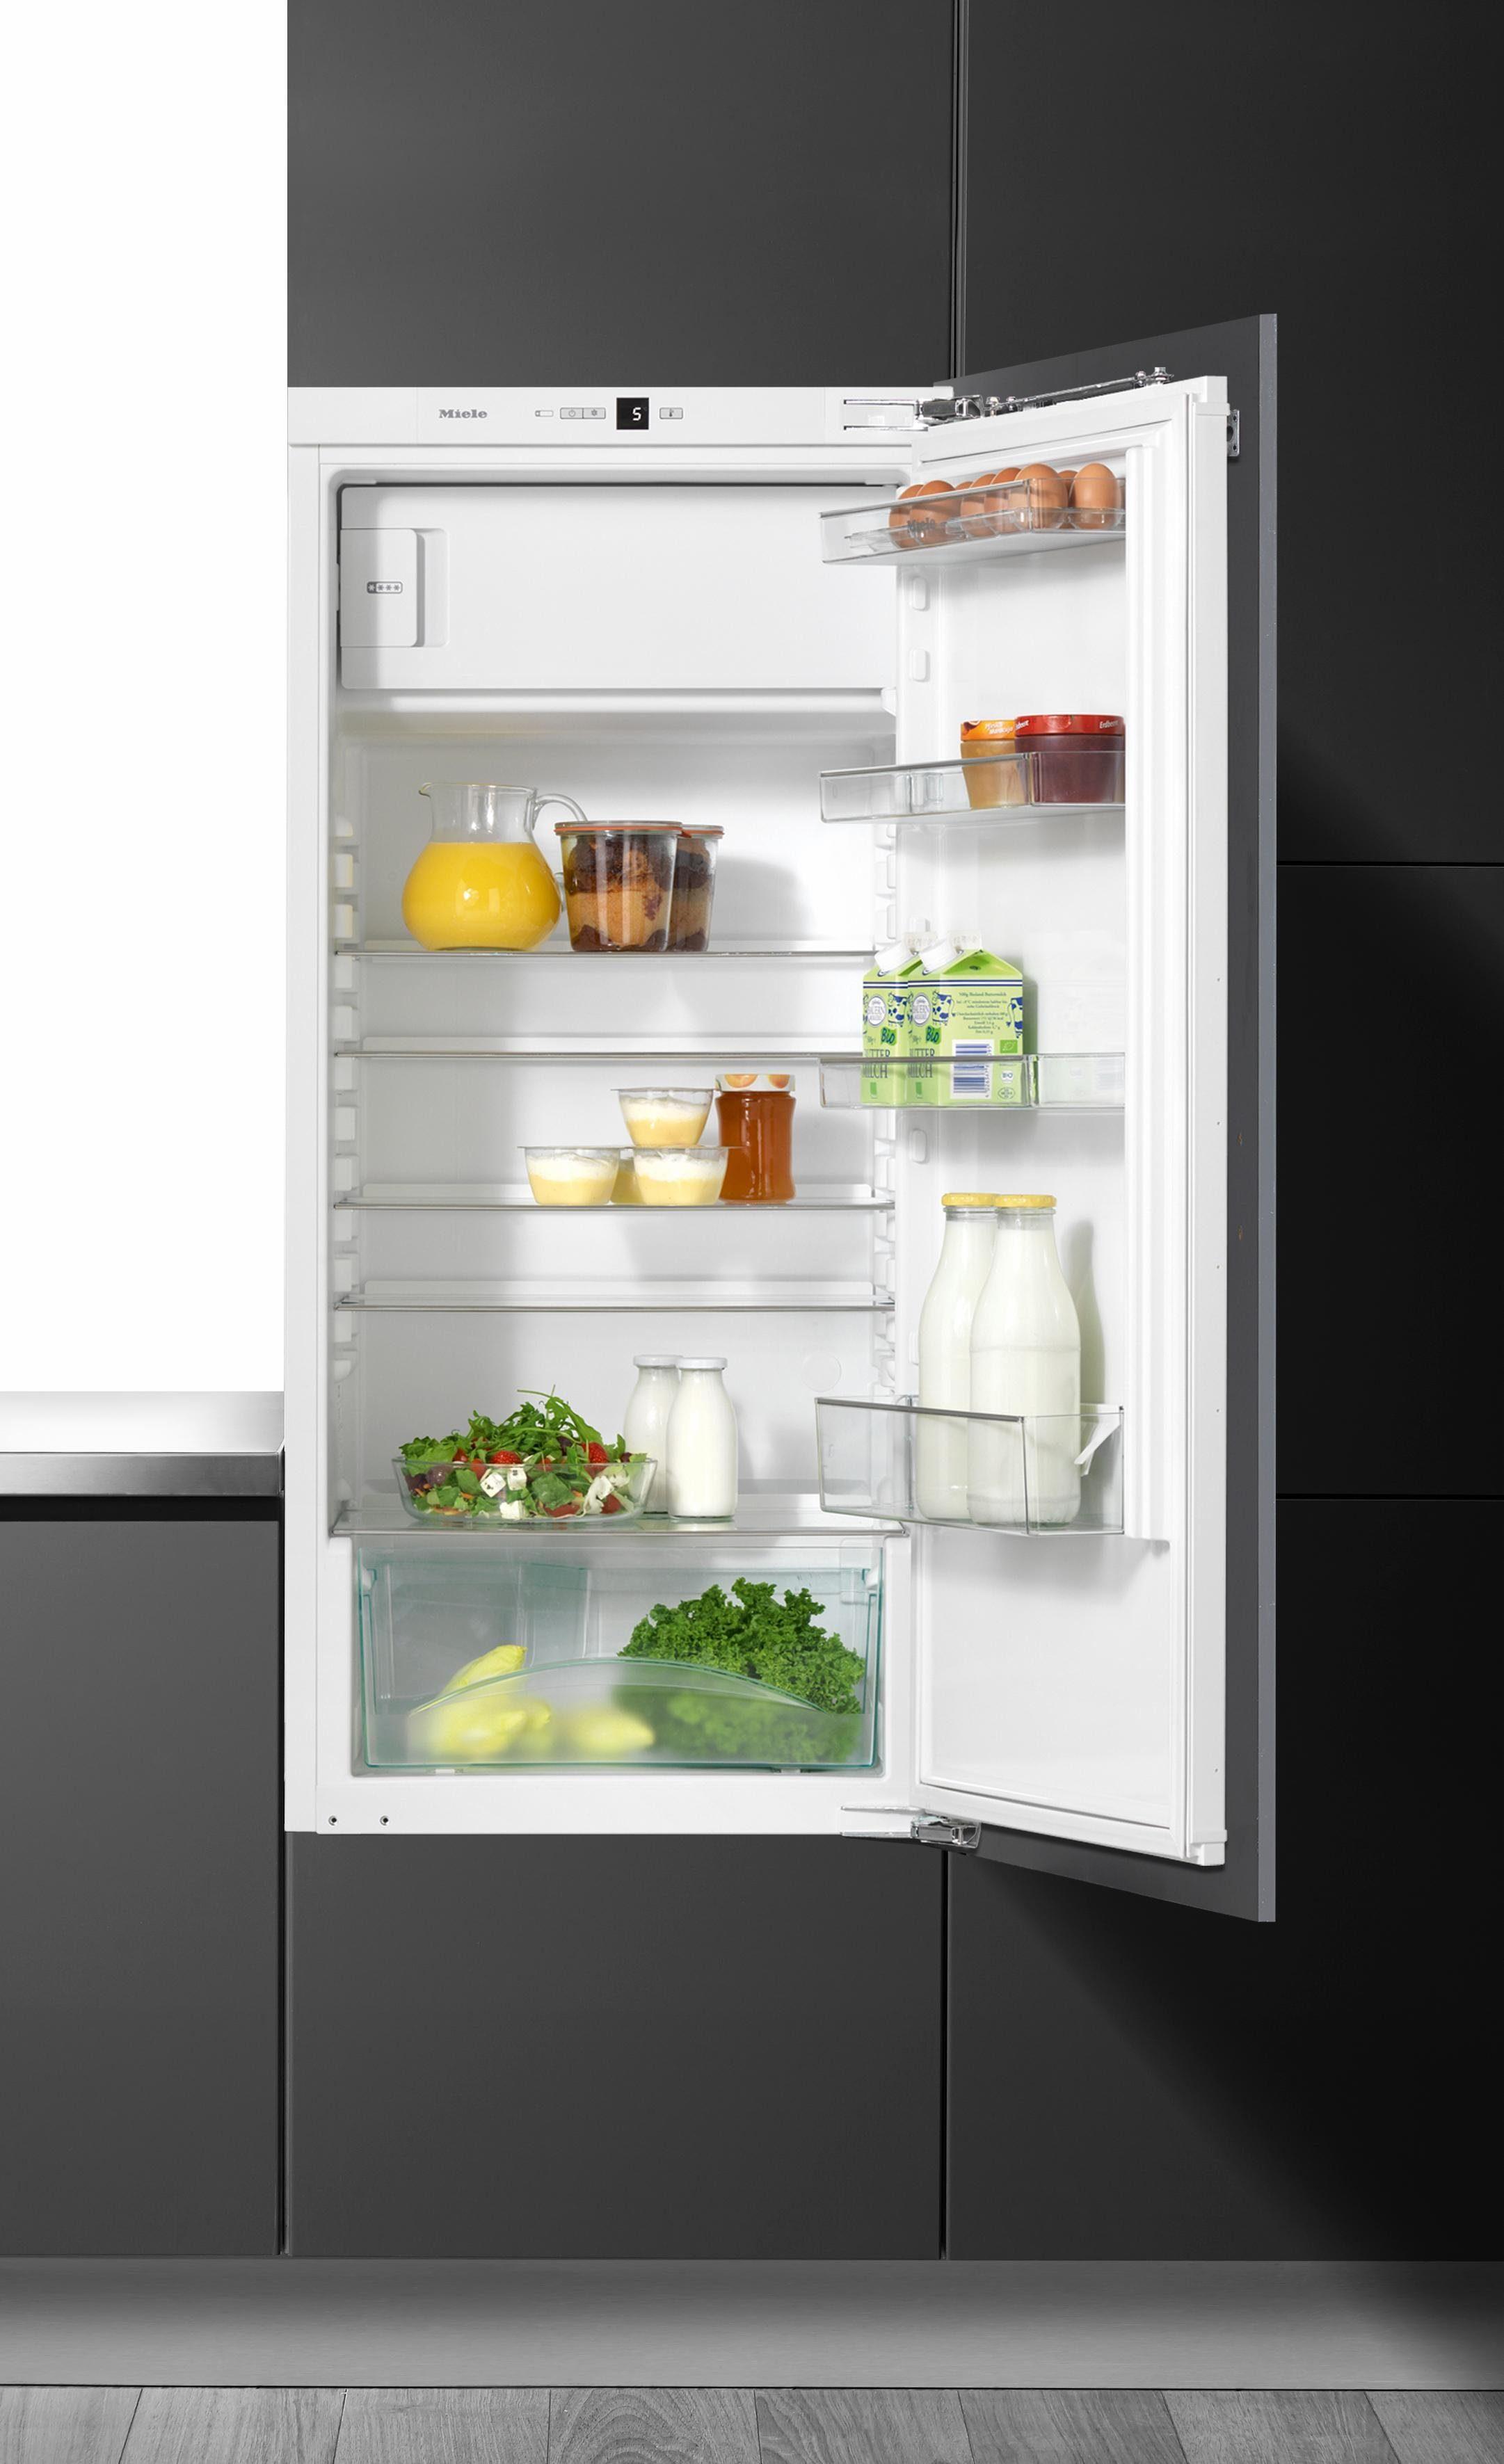 Miele integrierbarer Einbau-Kühlautomat K 34242 iF, A++